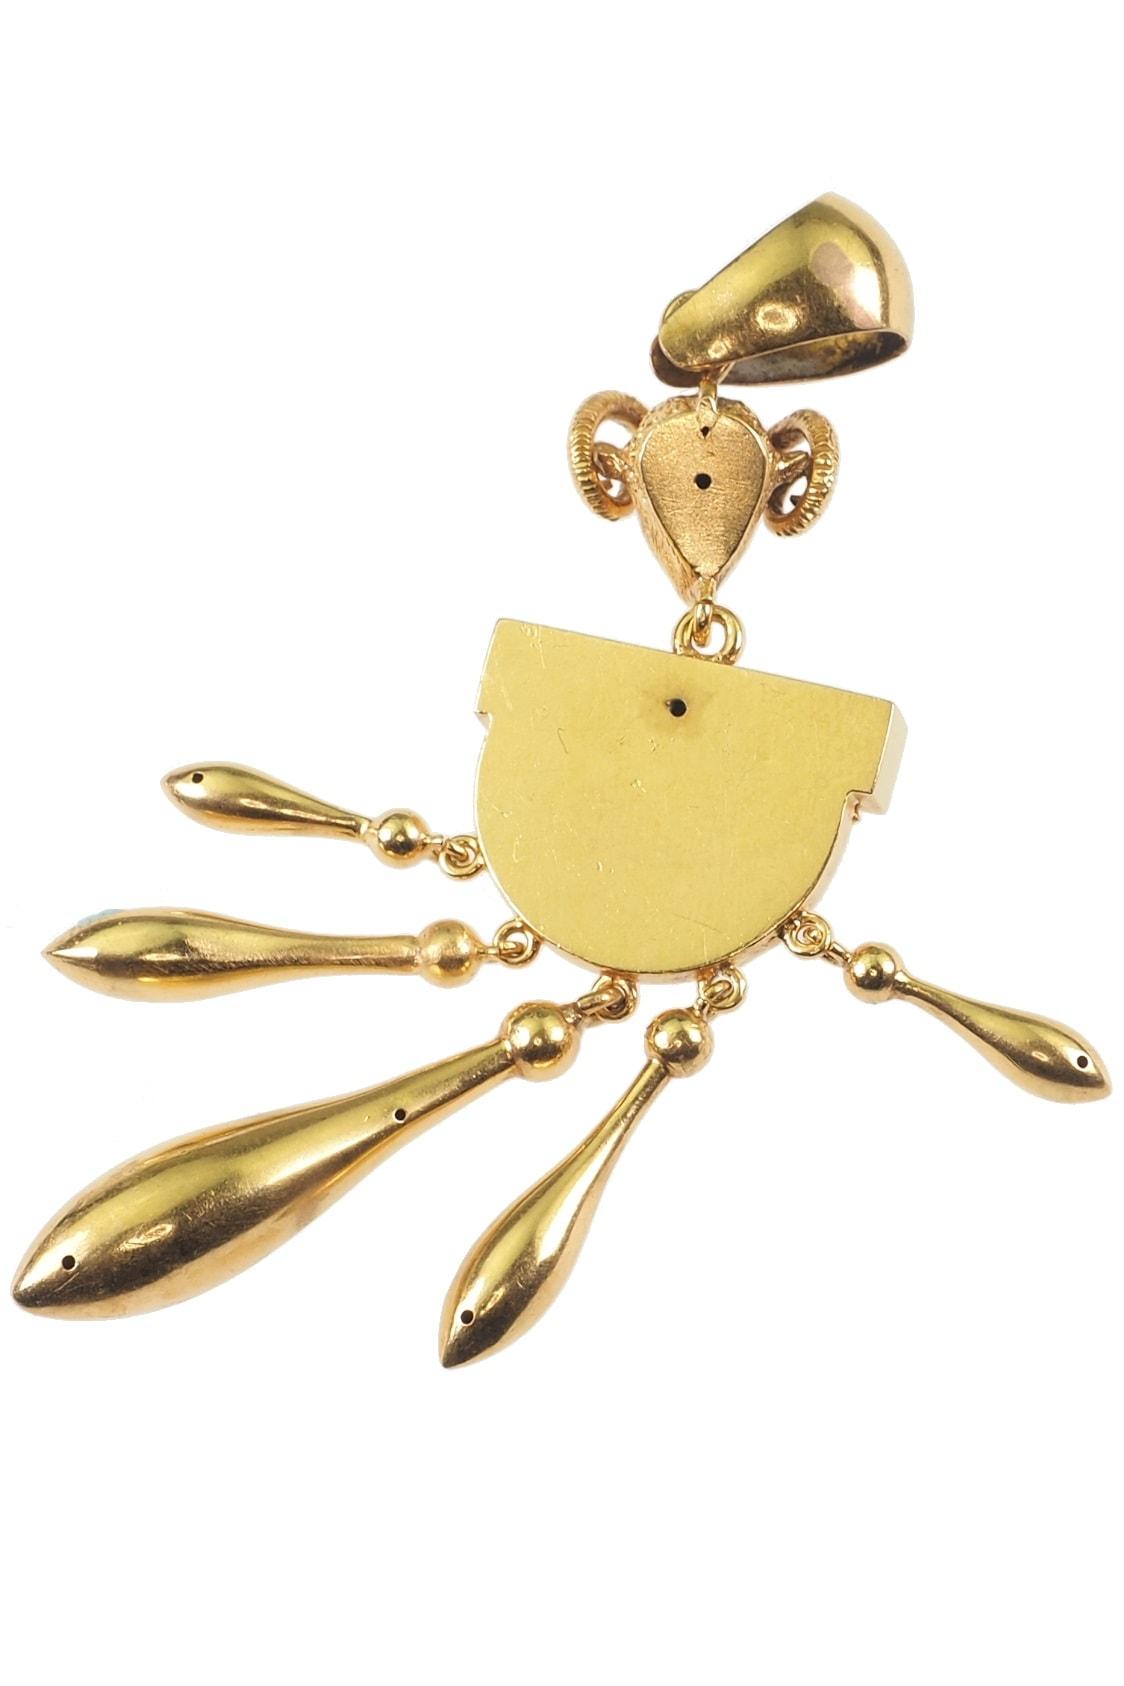 antike-Goldanhänger-kaufen-0288d